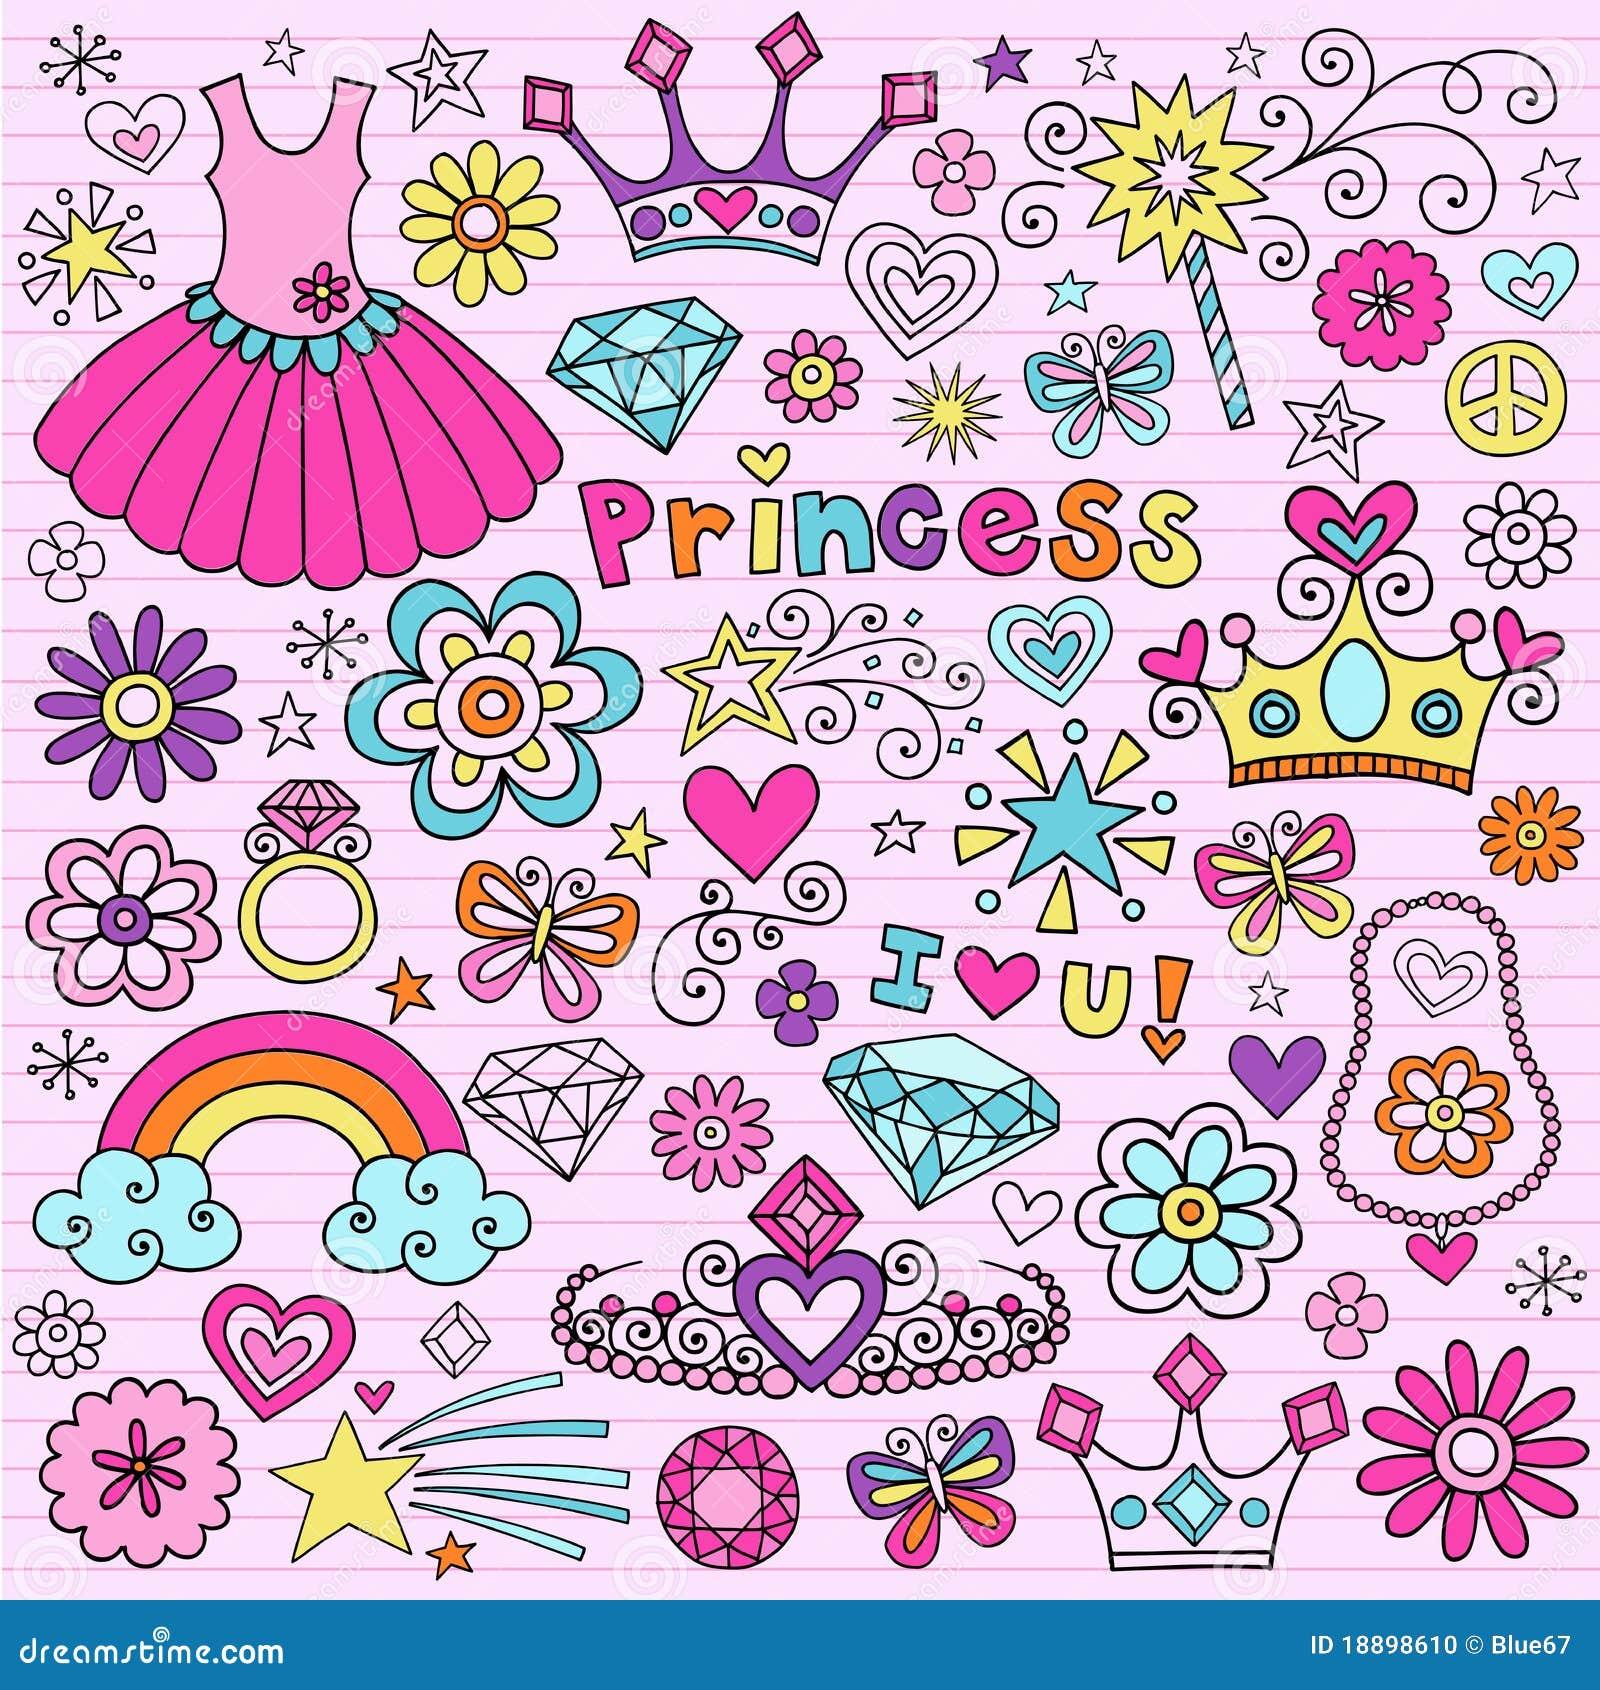 Princess Groovy Notebook Doodles